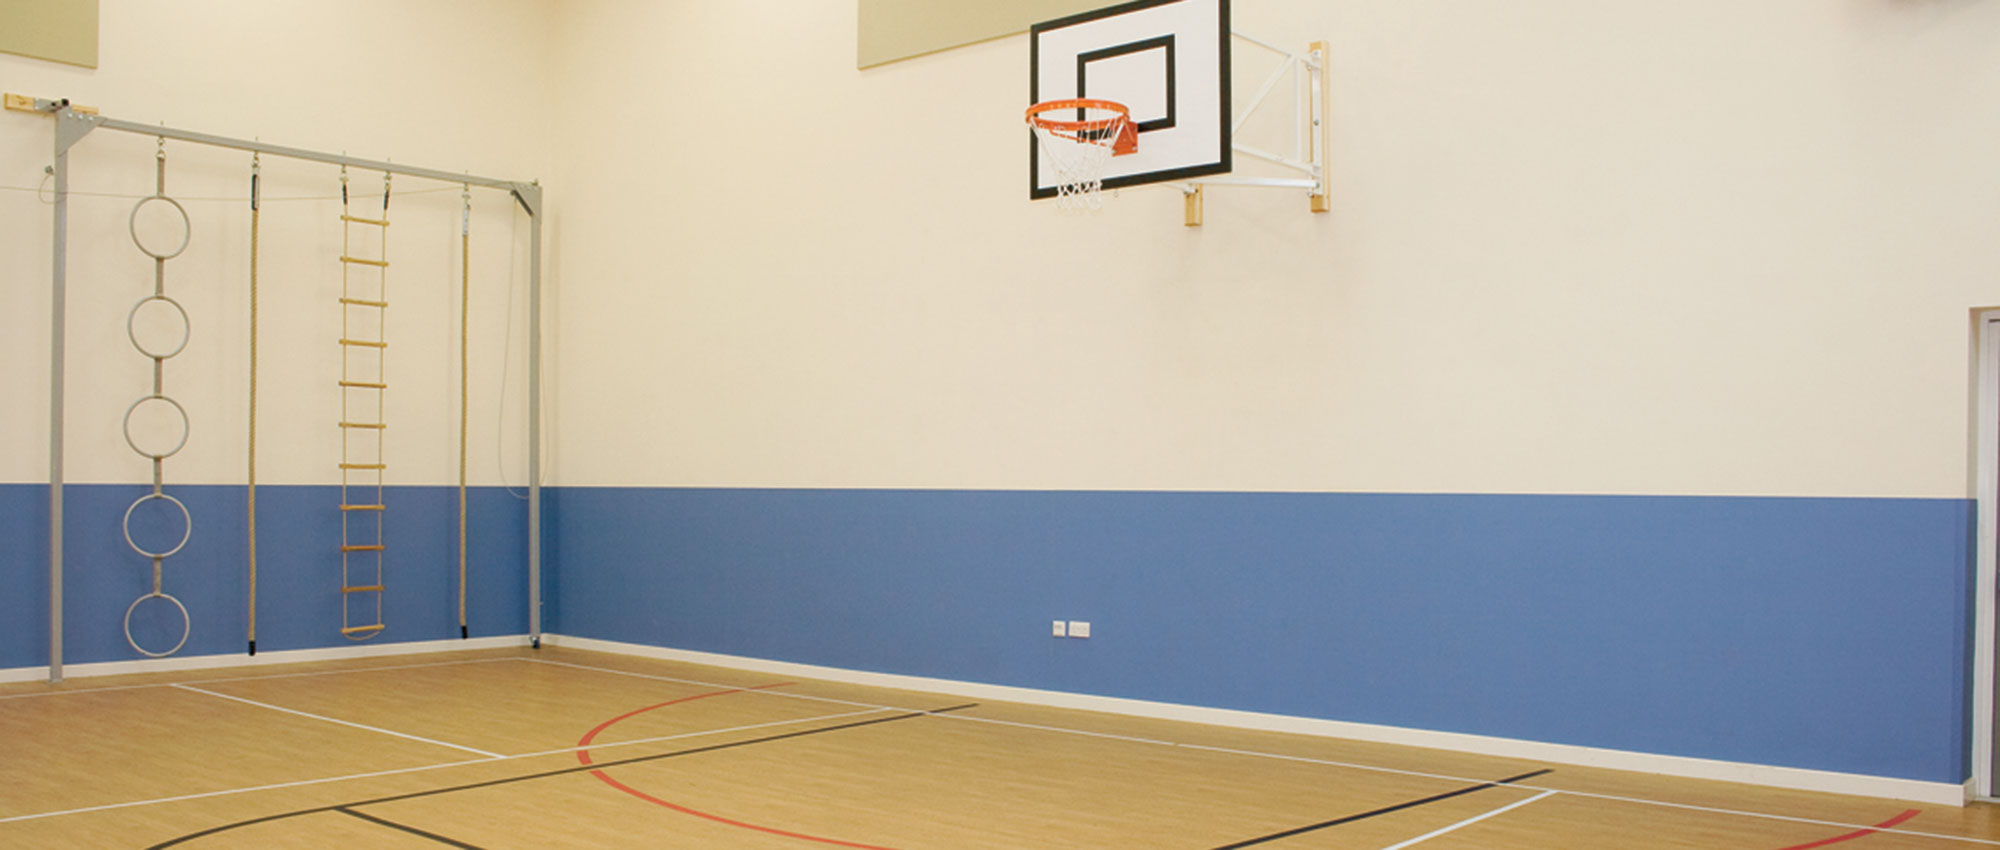 Case-Study-Oakfield-High-School,-Wigan-(1)